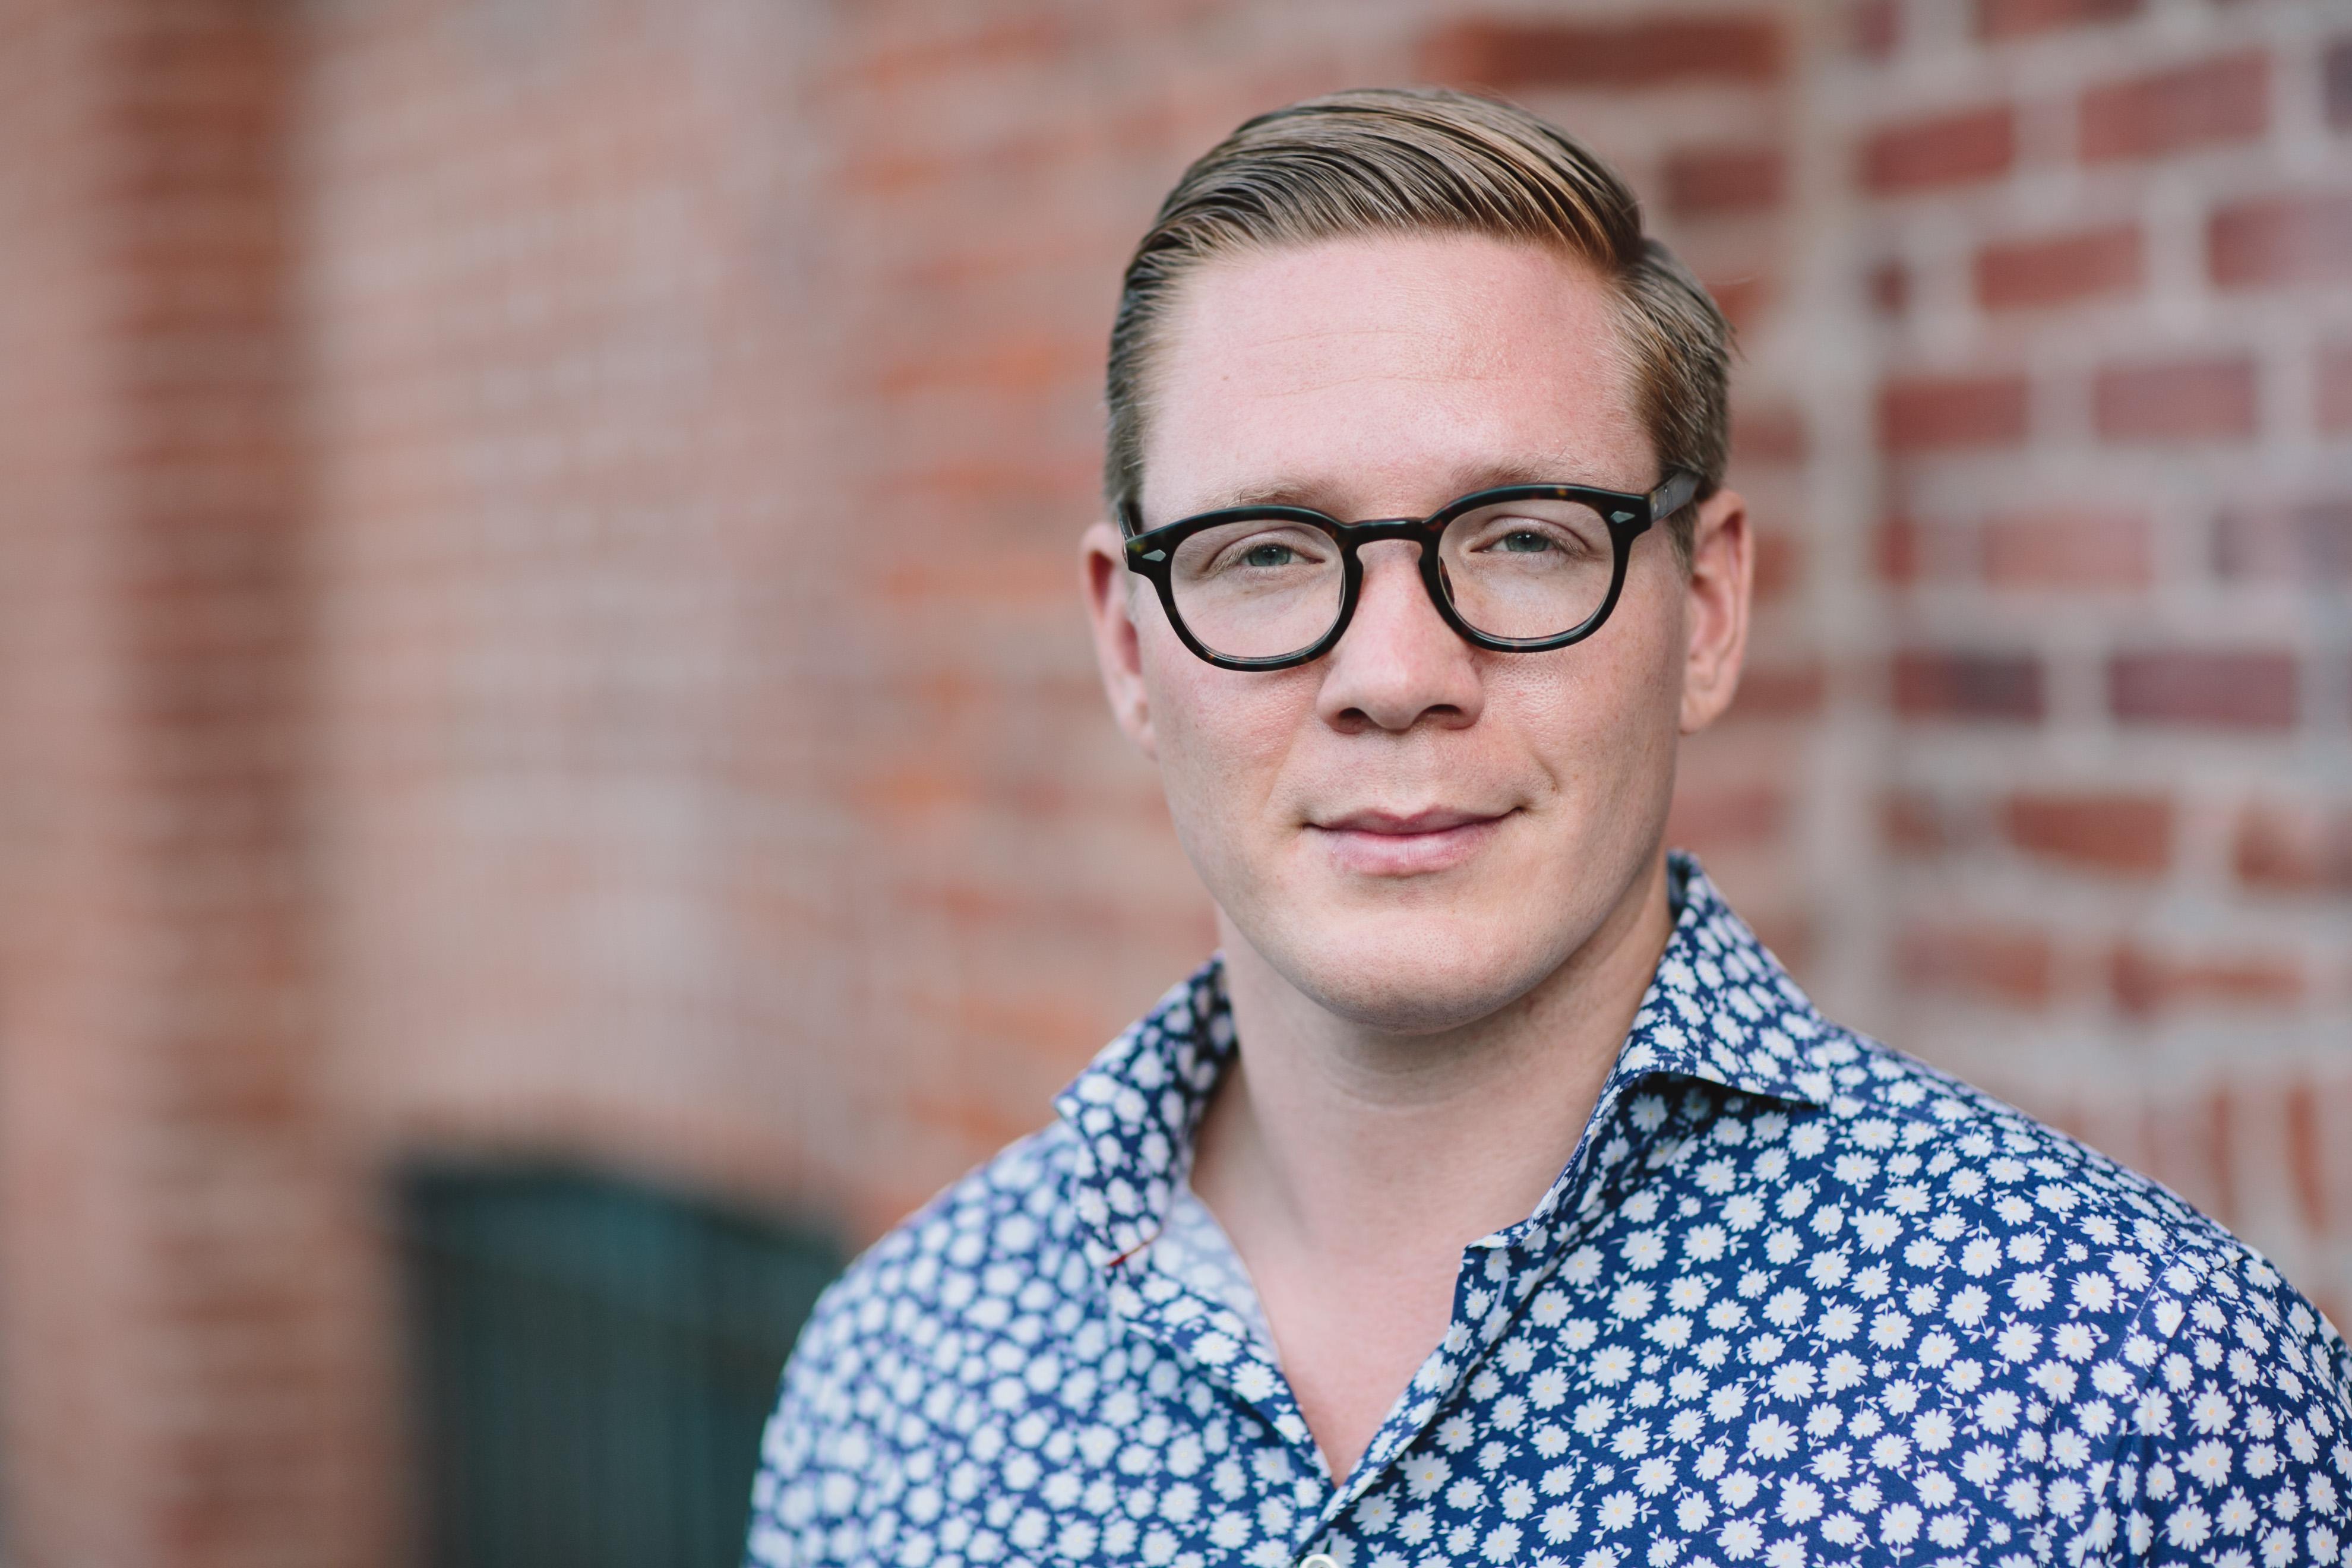 Image of Anders Sorman-Nilsson, a Swedish-Australian Futurist